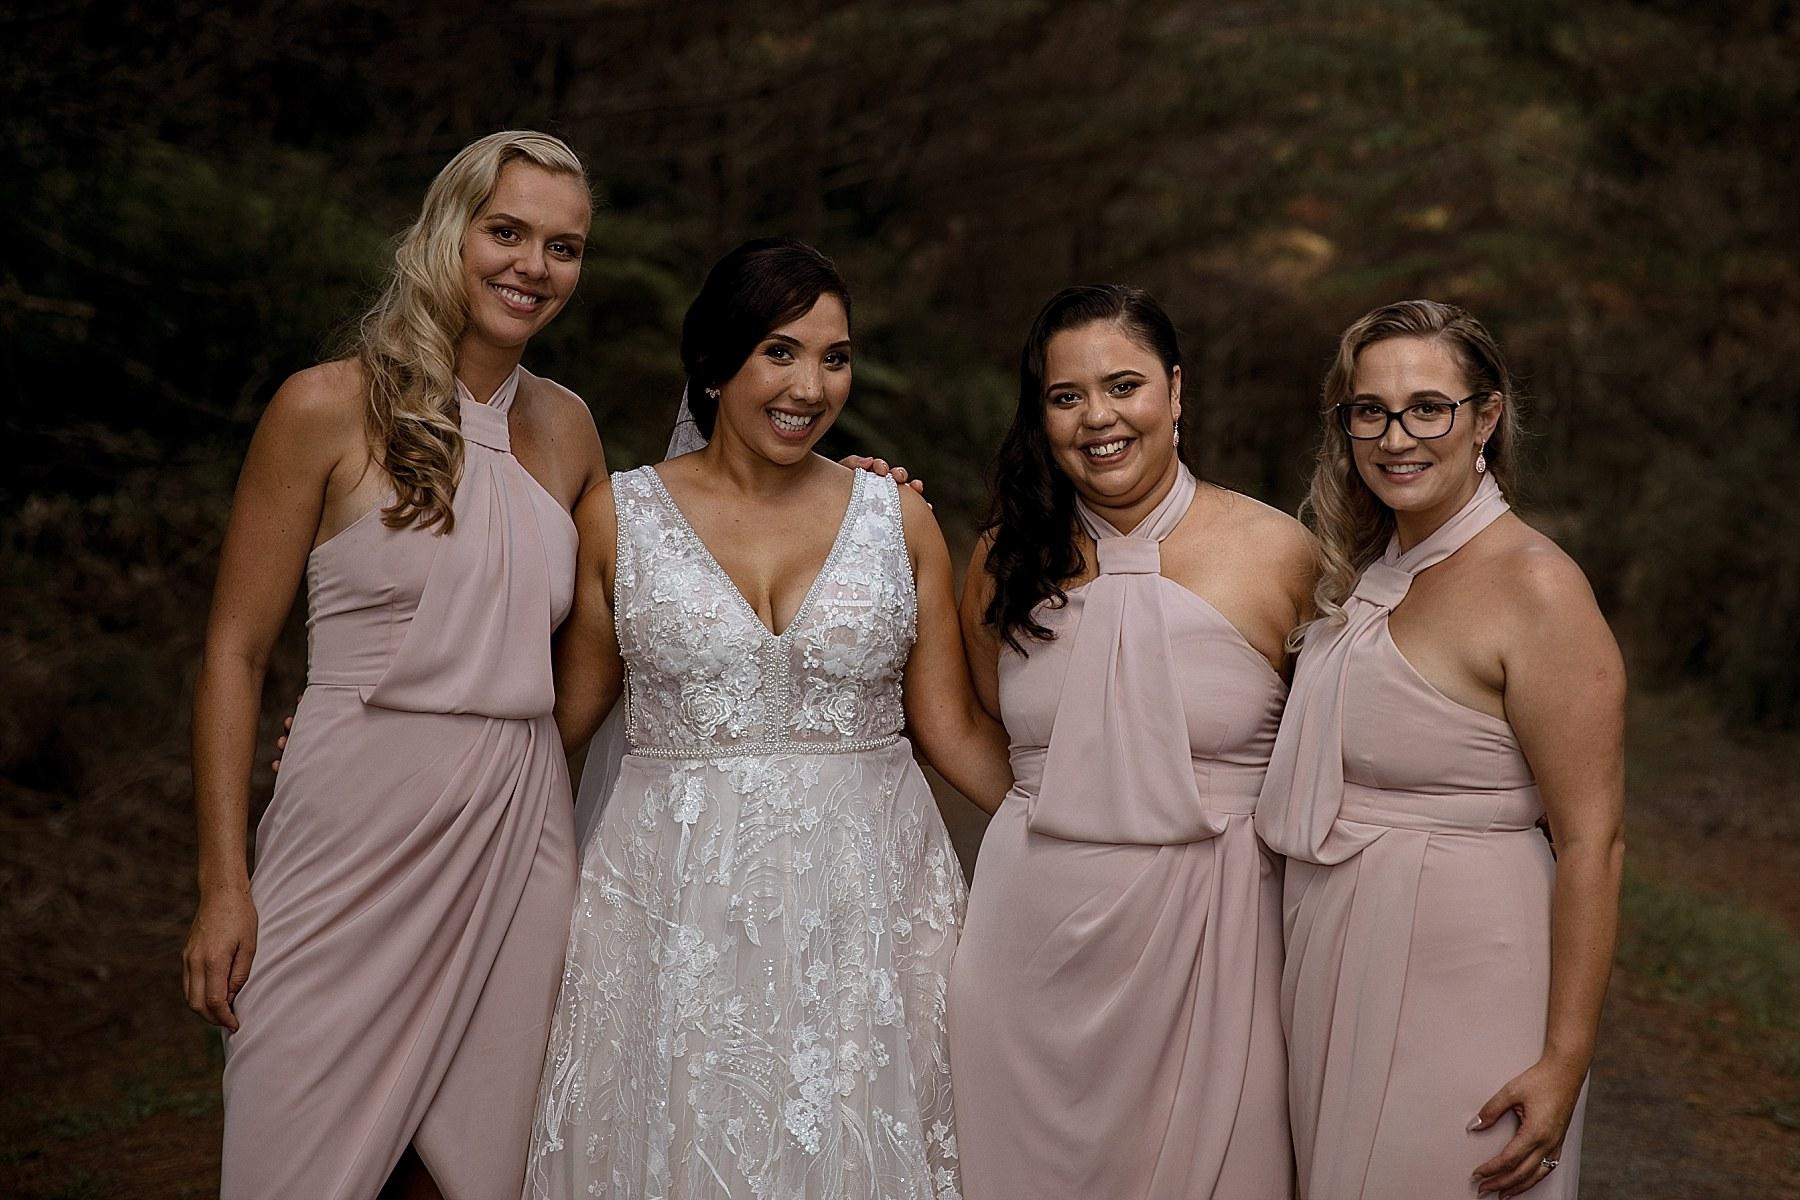 Kumeu Valley Estate Wedding Auckland Wedding Photographer - Hayley & Scott_0069.jpg